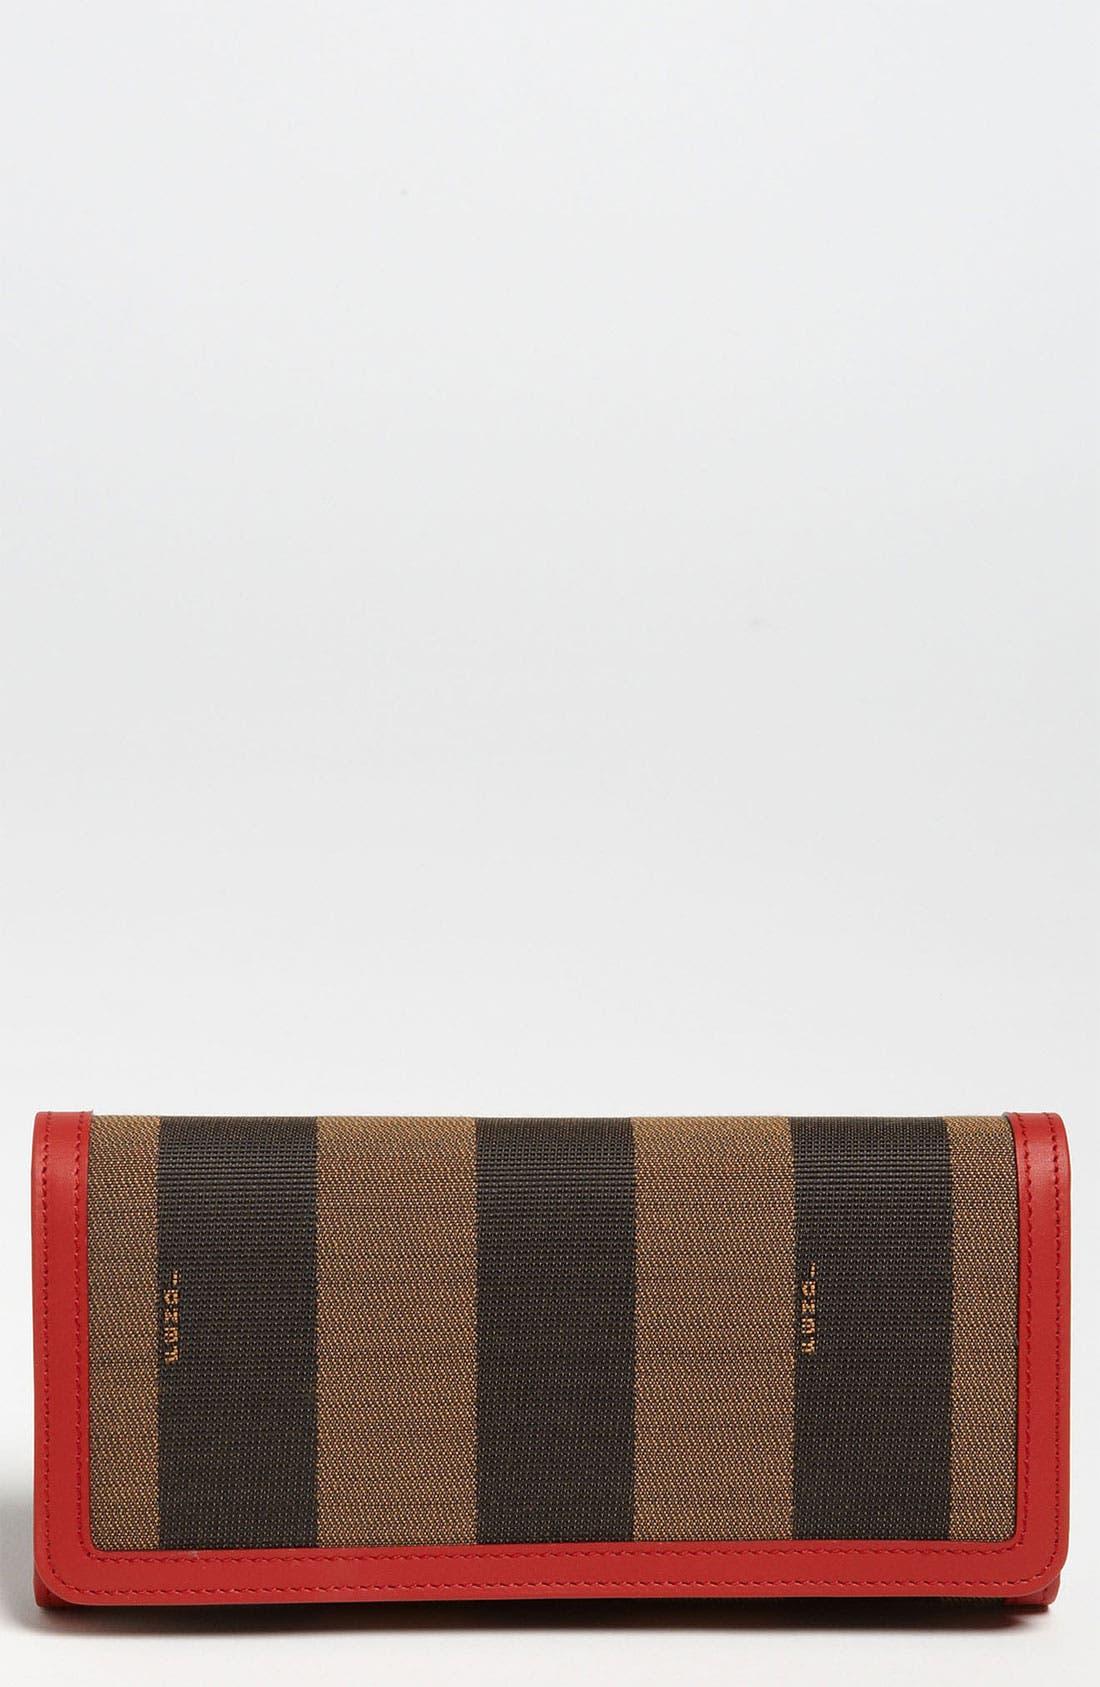 Alternate Image 1 Selected - Fendi 'Pequin' Continental Wallet